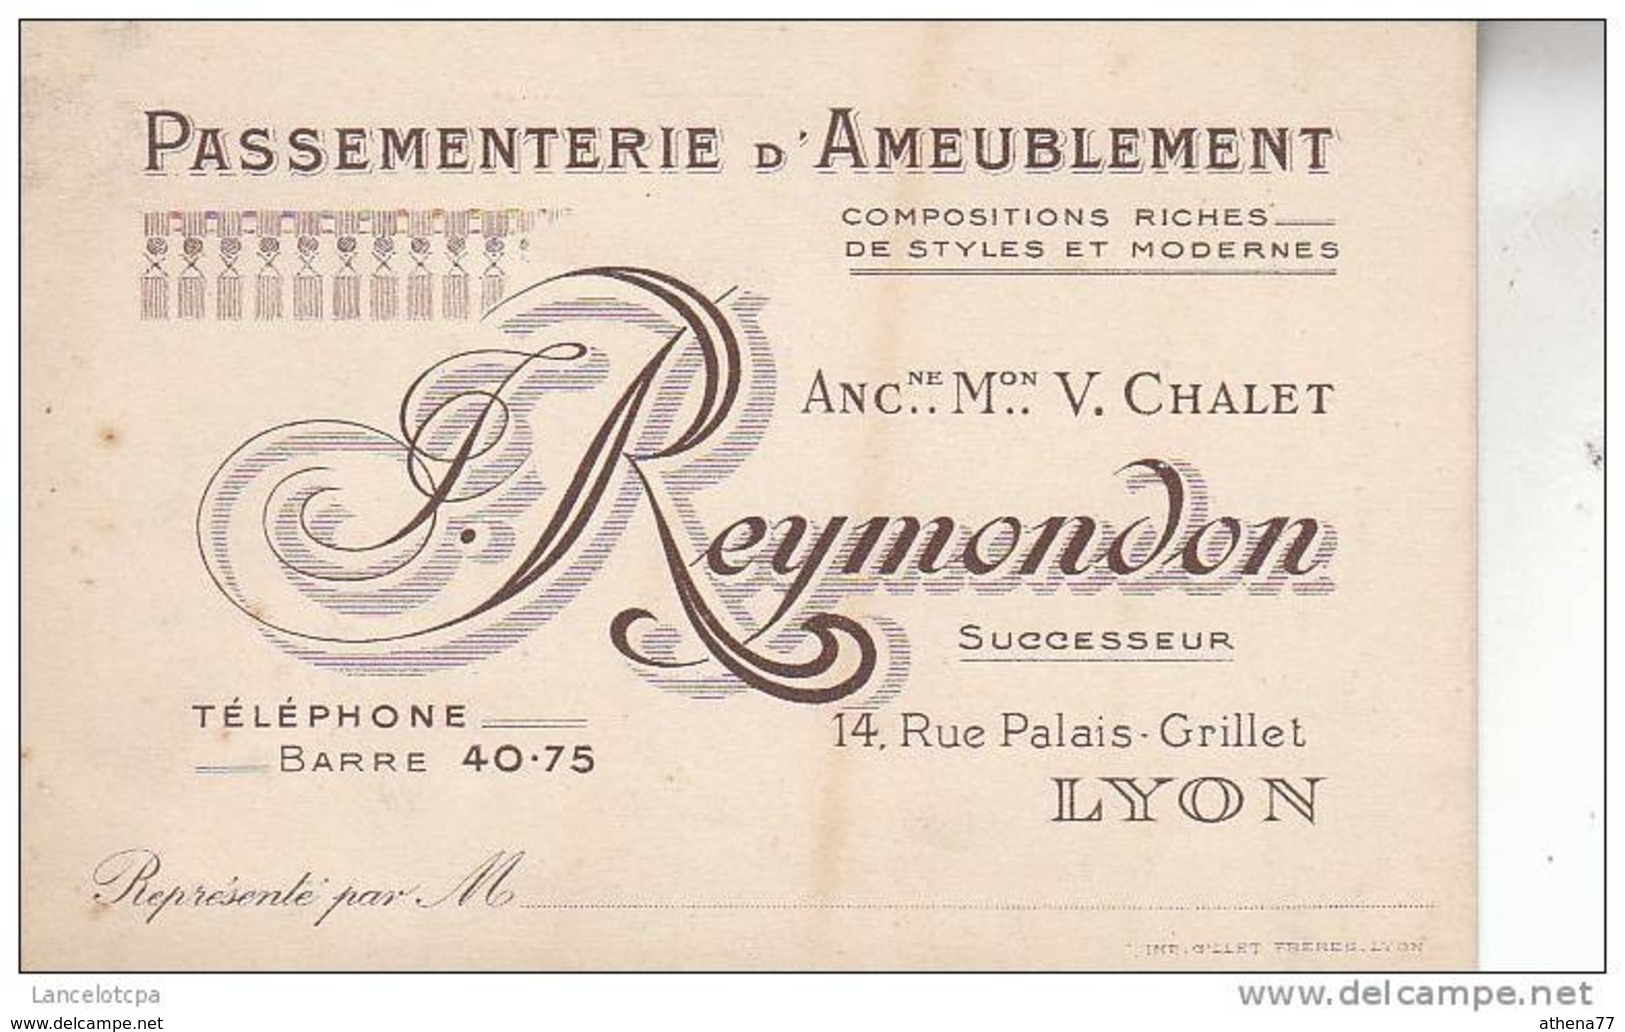 69 - LYON / CARTE DE VISITE - PASSEMENTERIE D'AMEUBLEMENT REYMONDON - 14 RUE PALAIS GRILLET - Cartoncini Da Visita